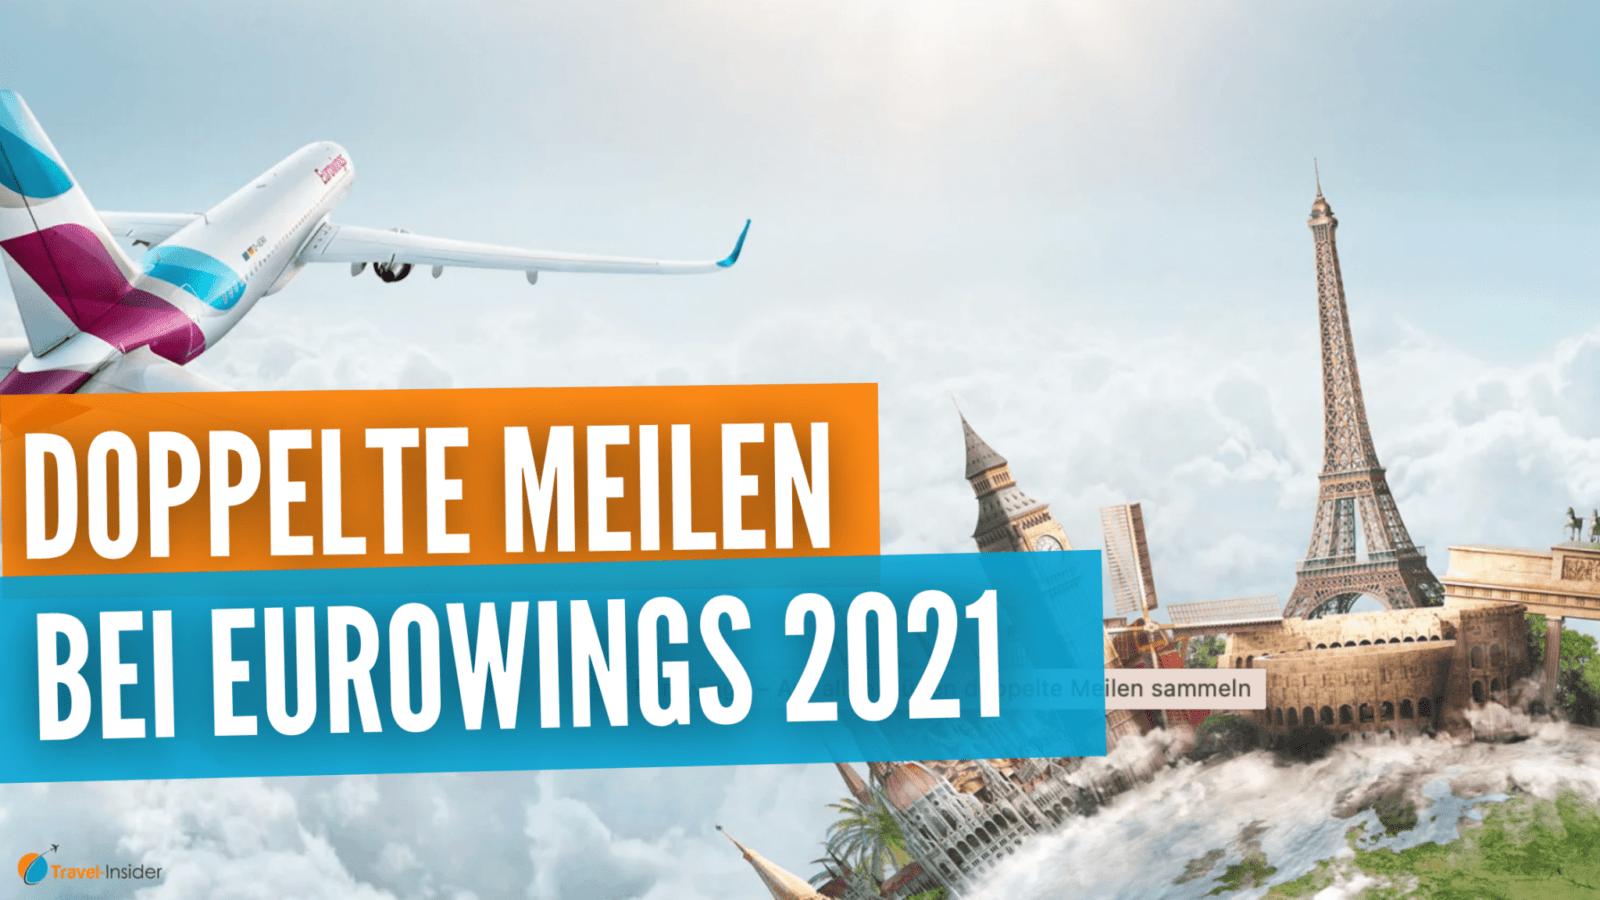 Doppelte Prämienmeilen bei Eurowings bis Ende 2021